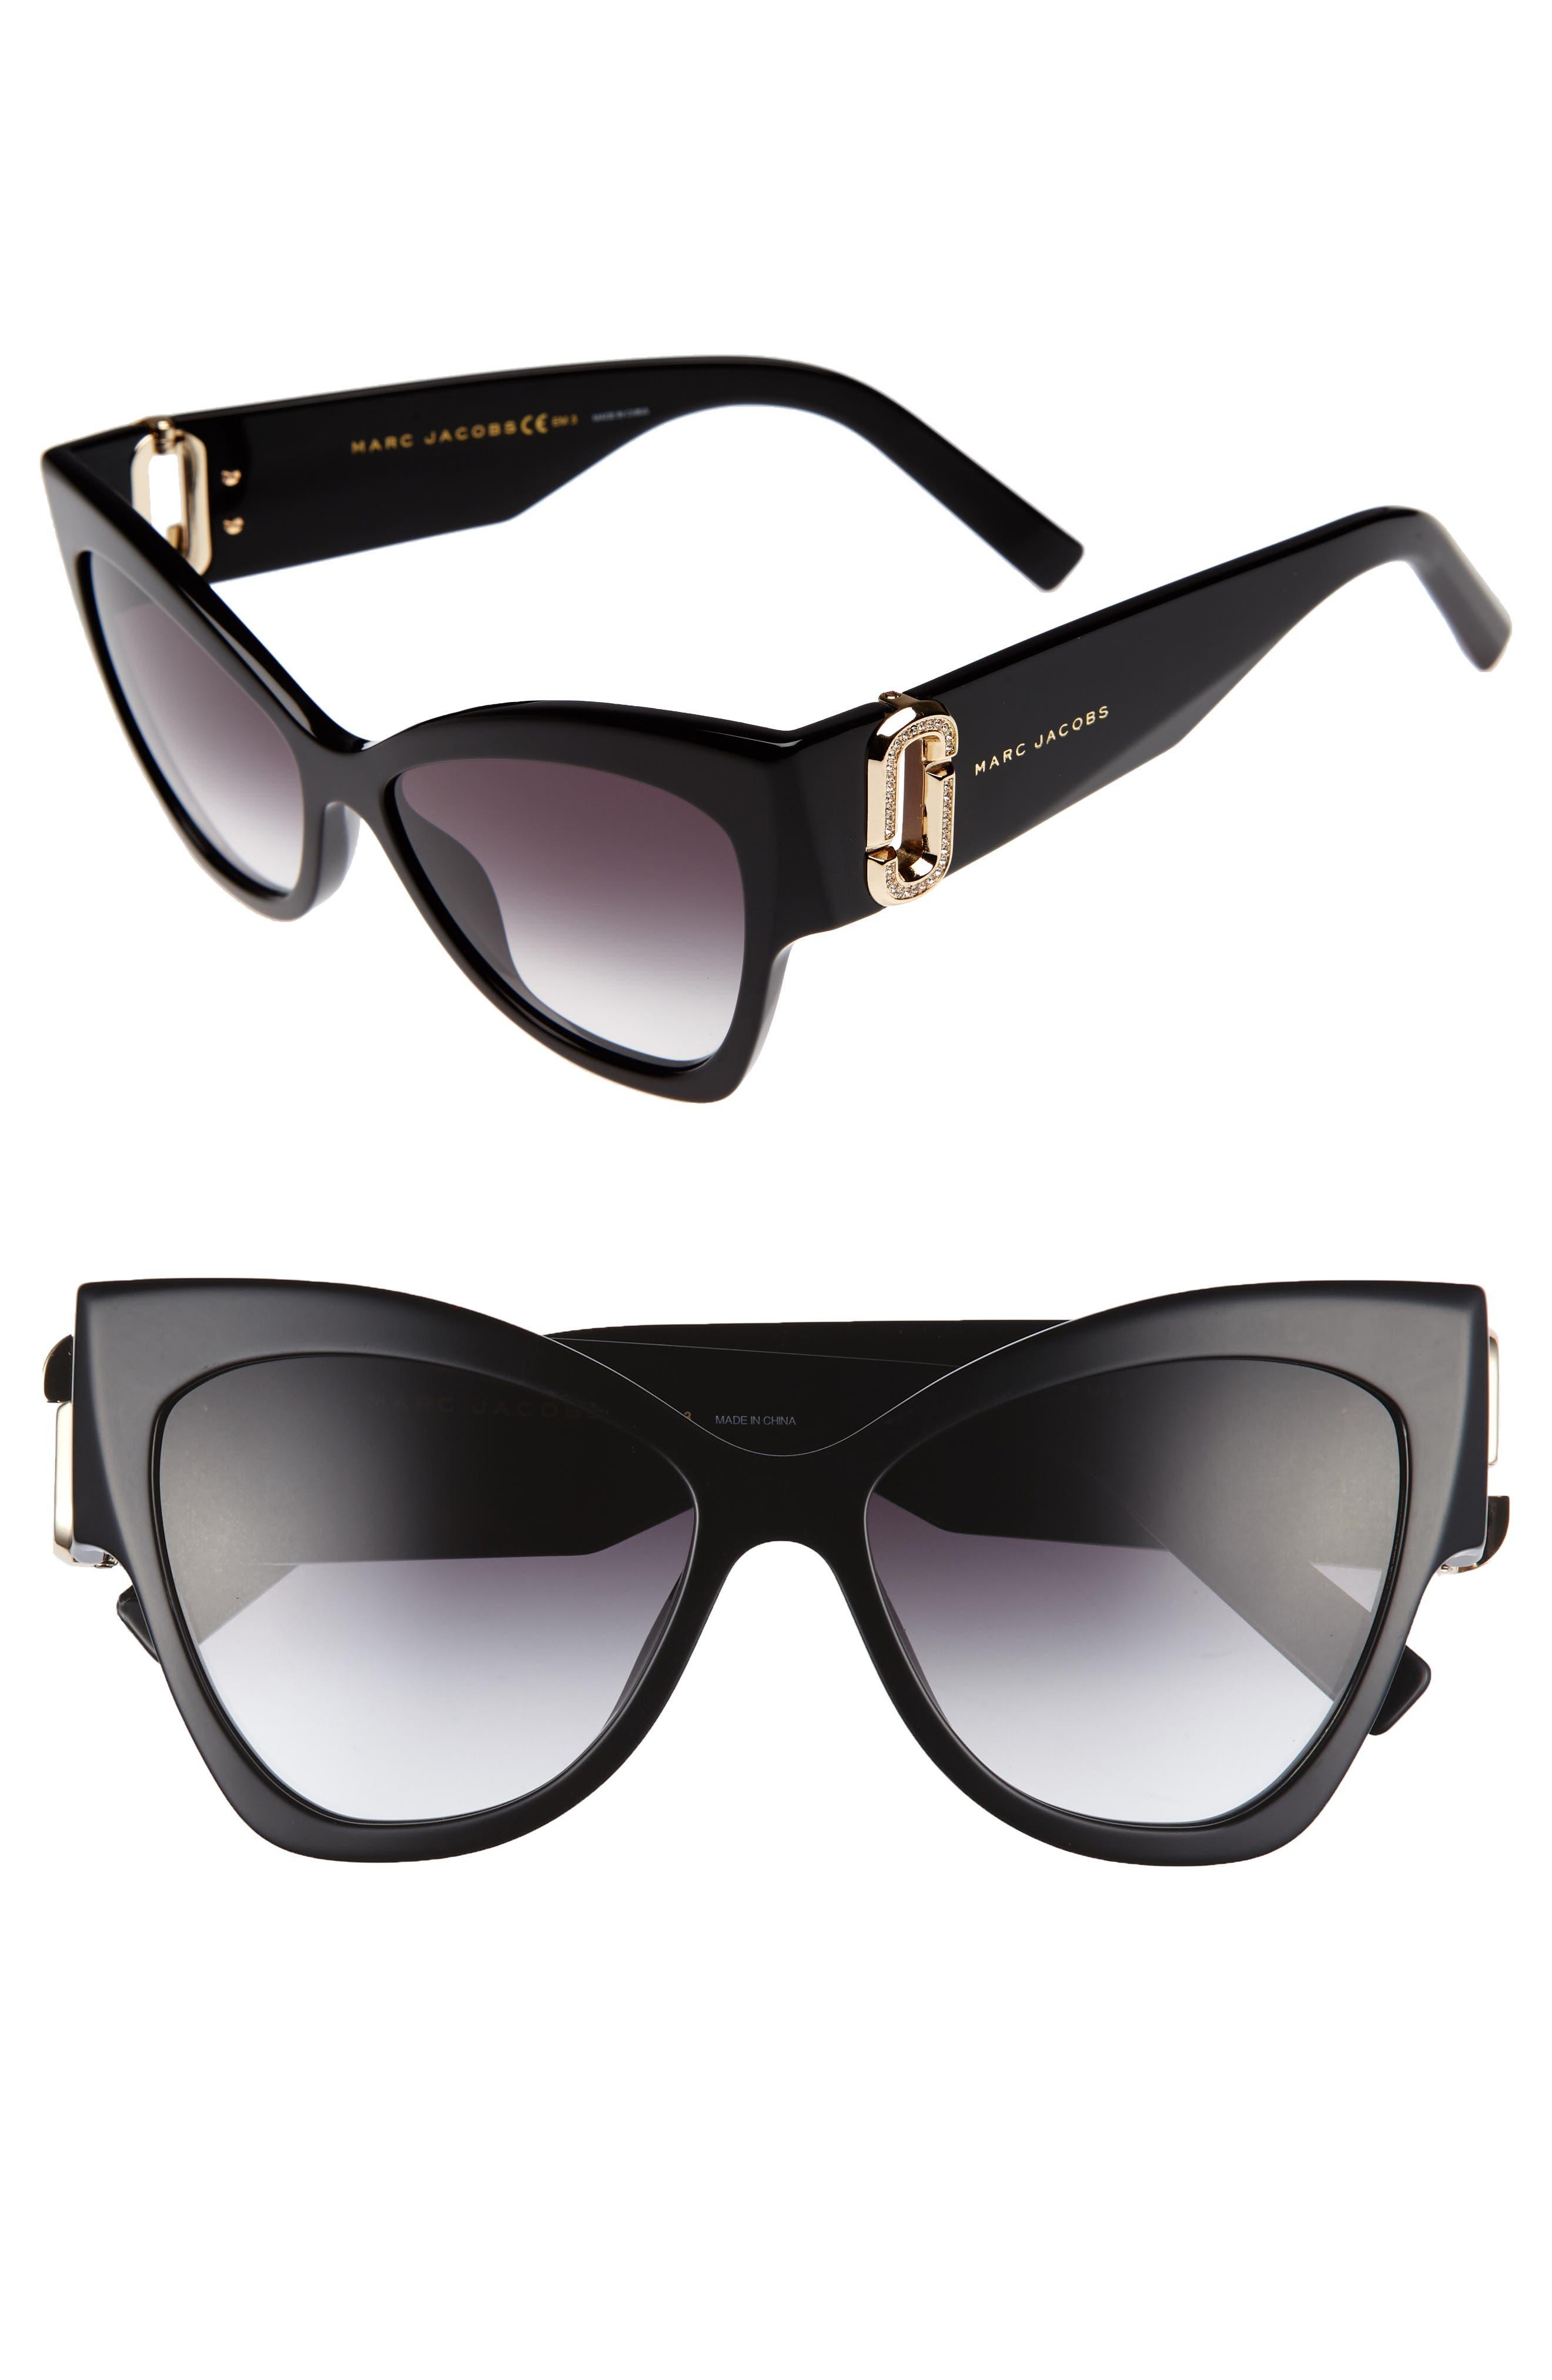 54mm Cat Eye Sunglasses,                         Main,                         color, Black